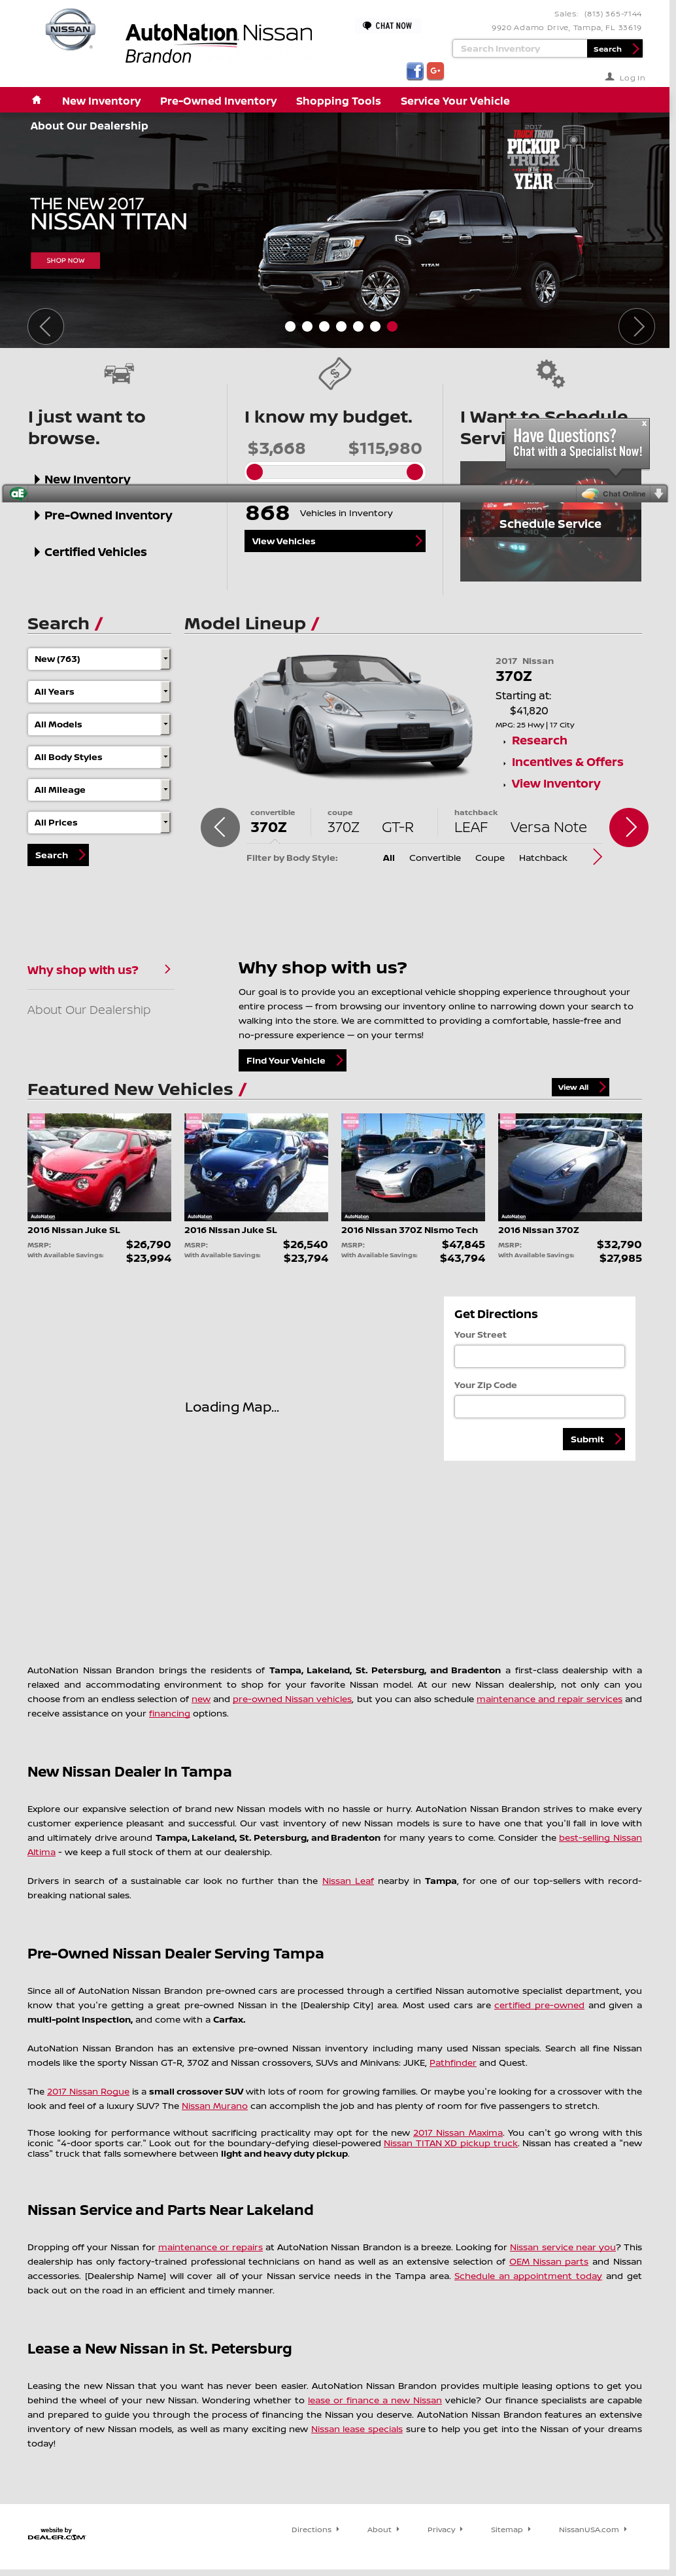 Lovely AutoWay Nissan Of Brandon Website History